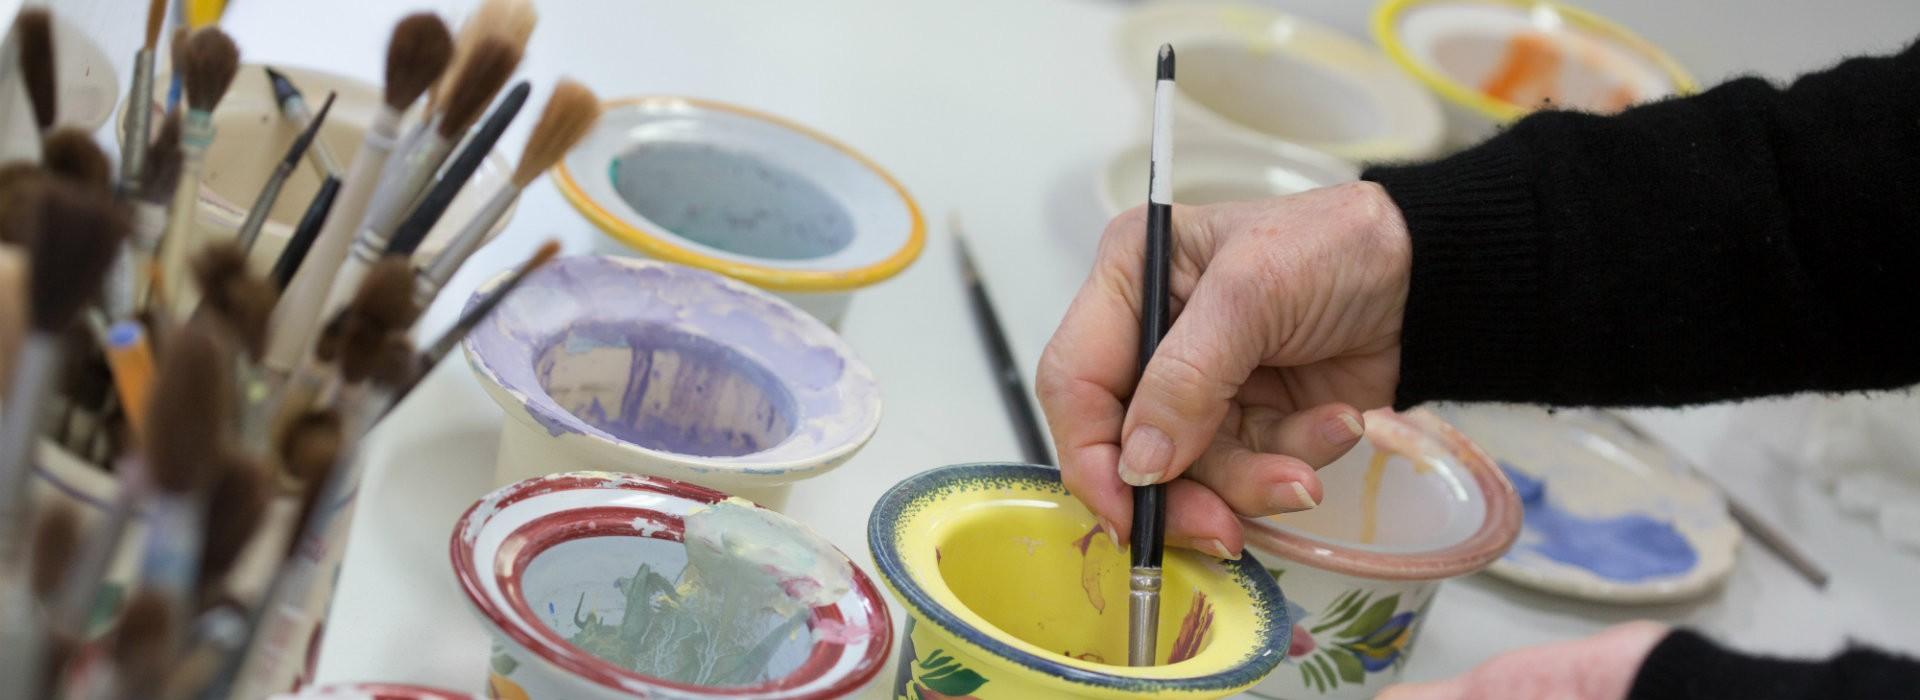 Art et Artisanat - CRT Bretagne - Simon Bourcier